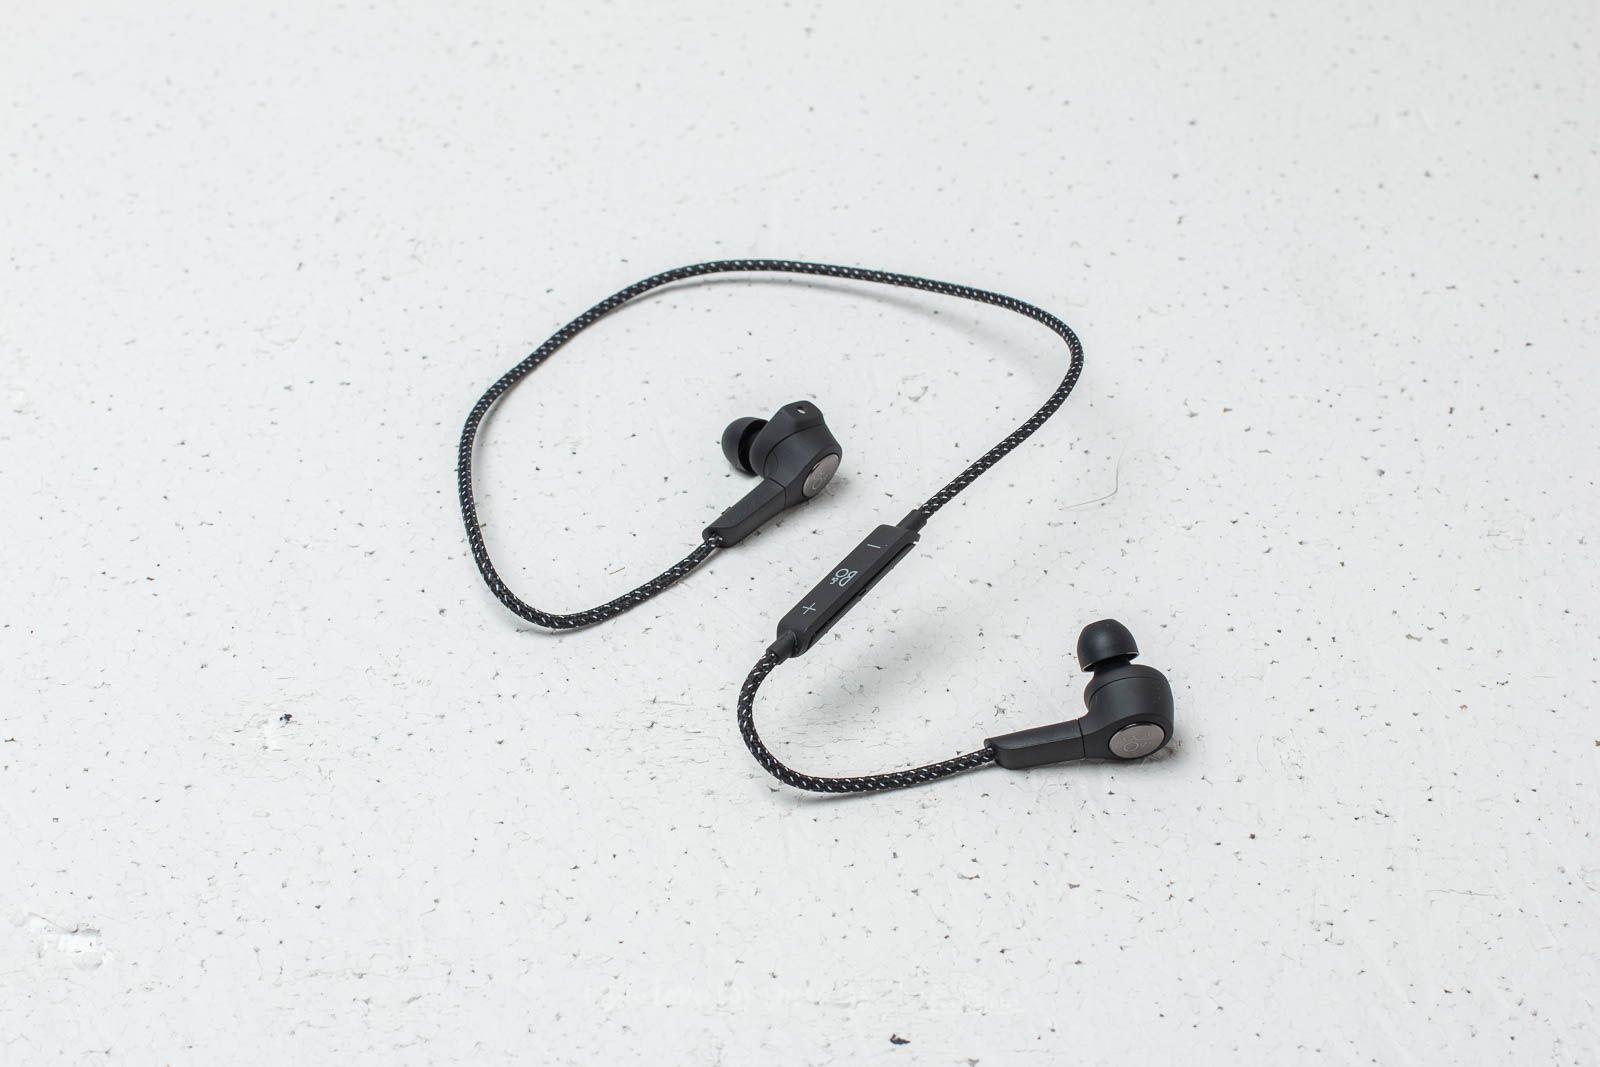 Bang & Olufsen Beoplay H5 Wireless Earphones Black W super cenie 1 091 zł kupuj na Footshop.pl